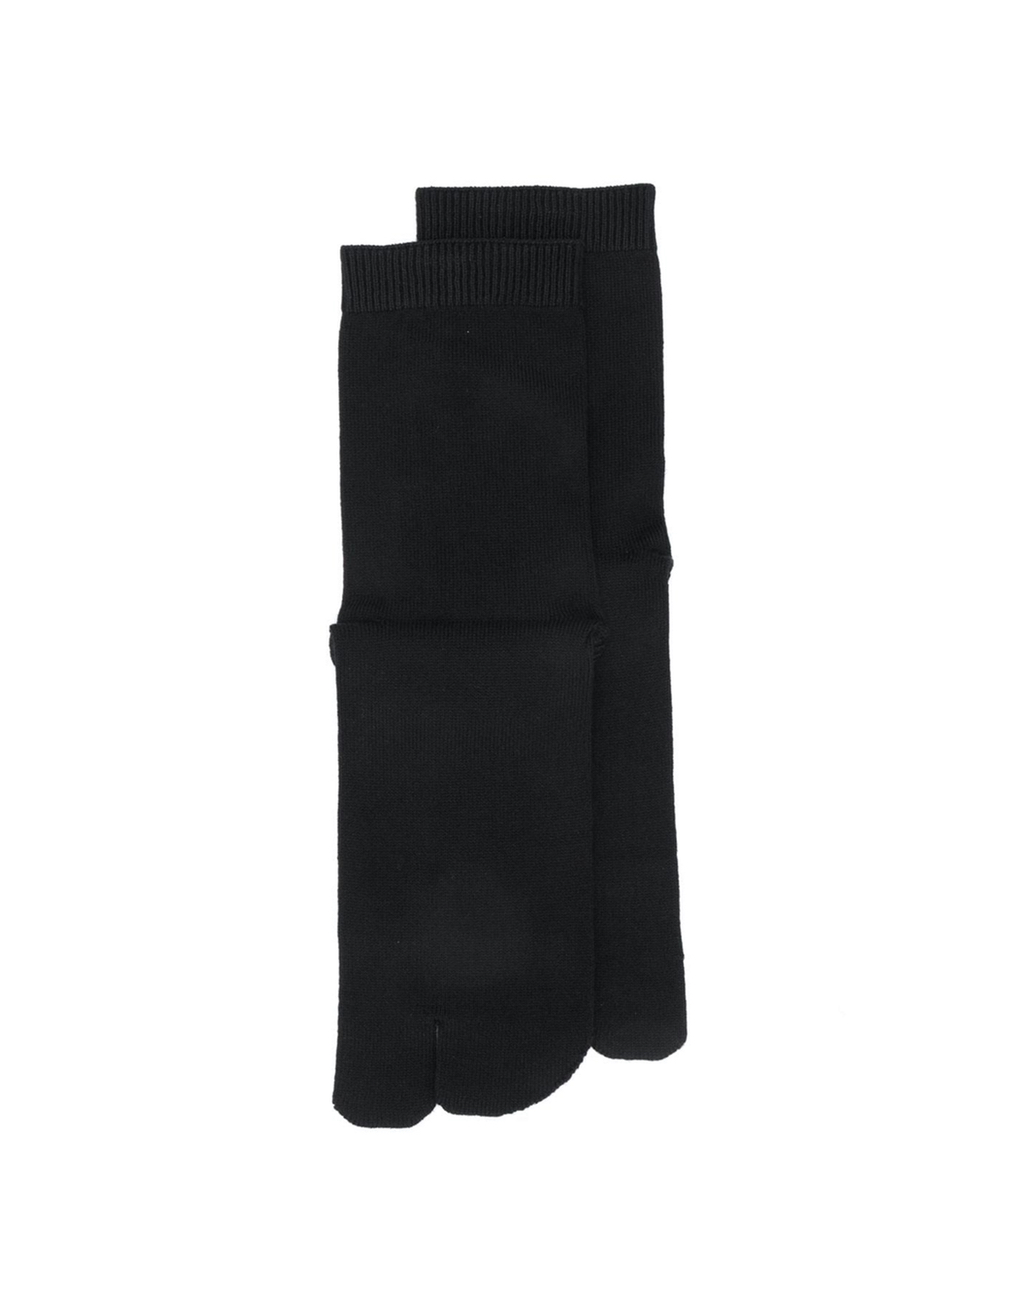 Maison Margiela Black Cotton Tabi Socks